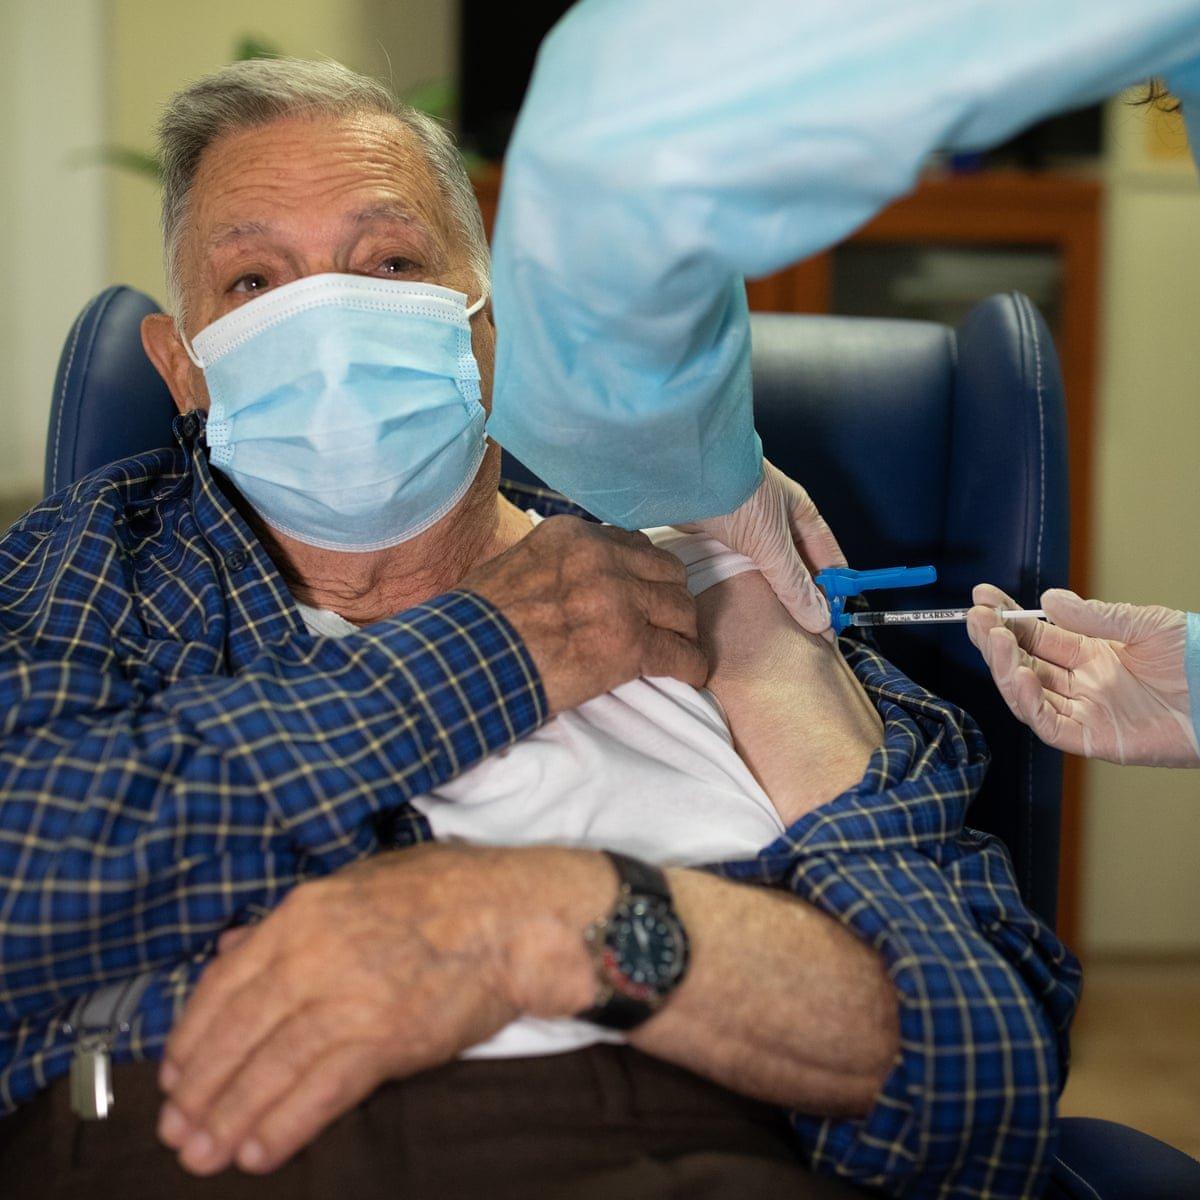 L'Espagne tiendra un registre de toutes les personnes qui refusent le vaccin contre la COVID-19